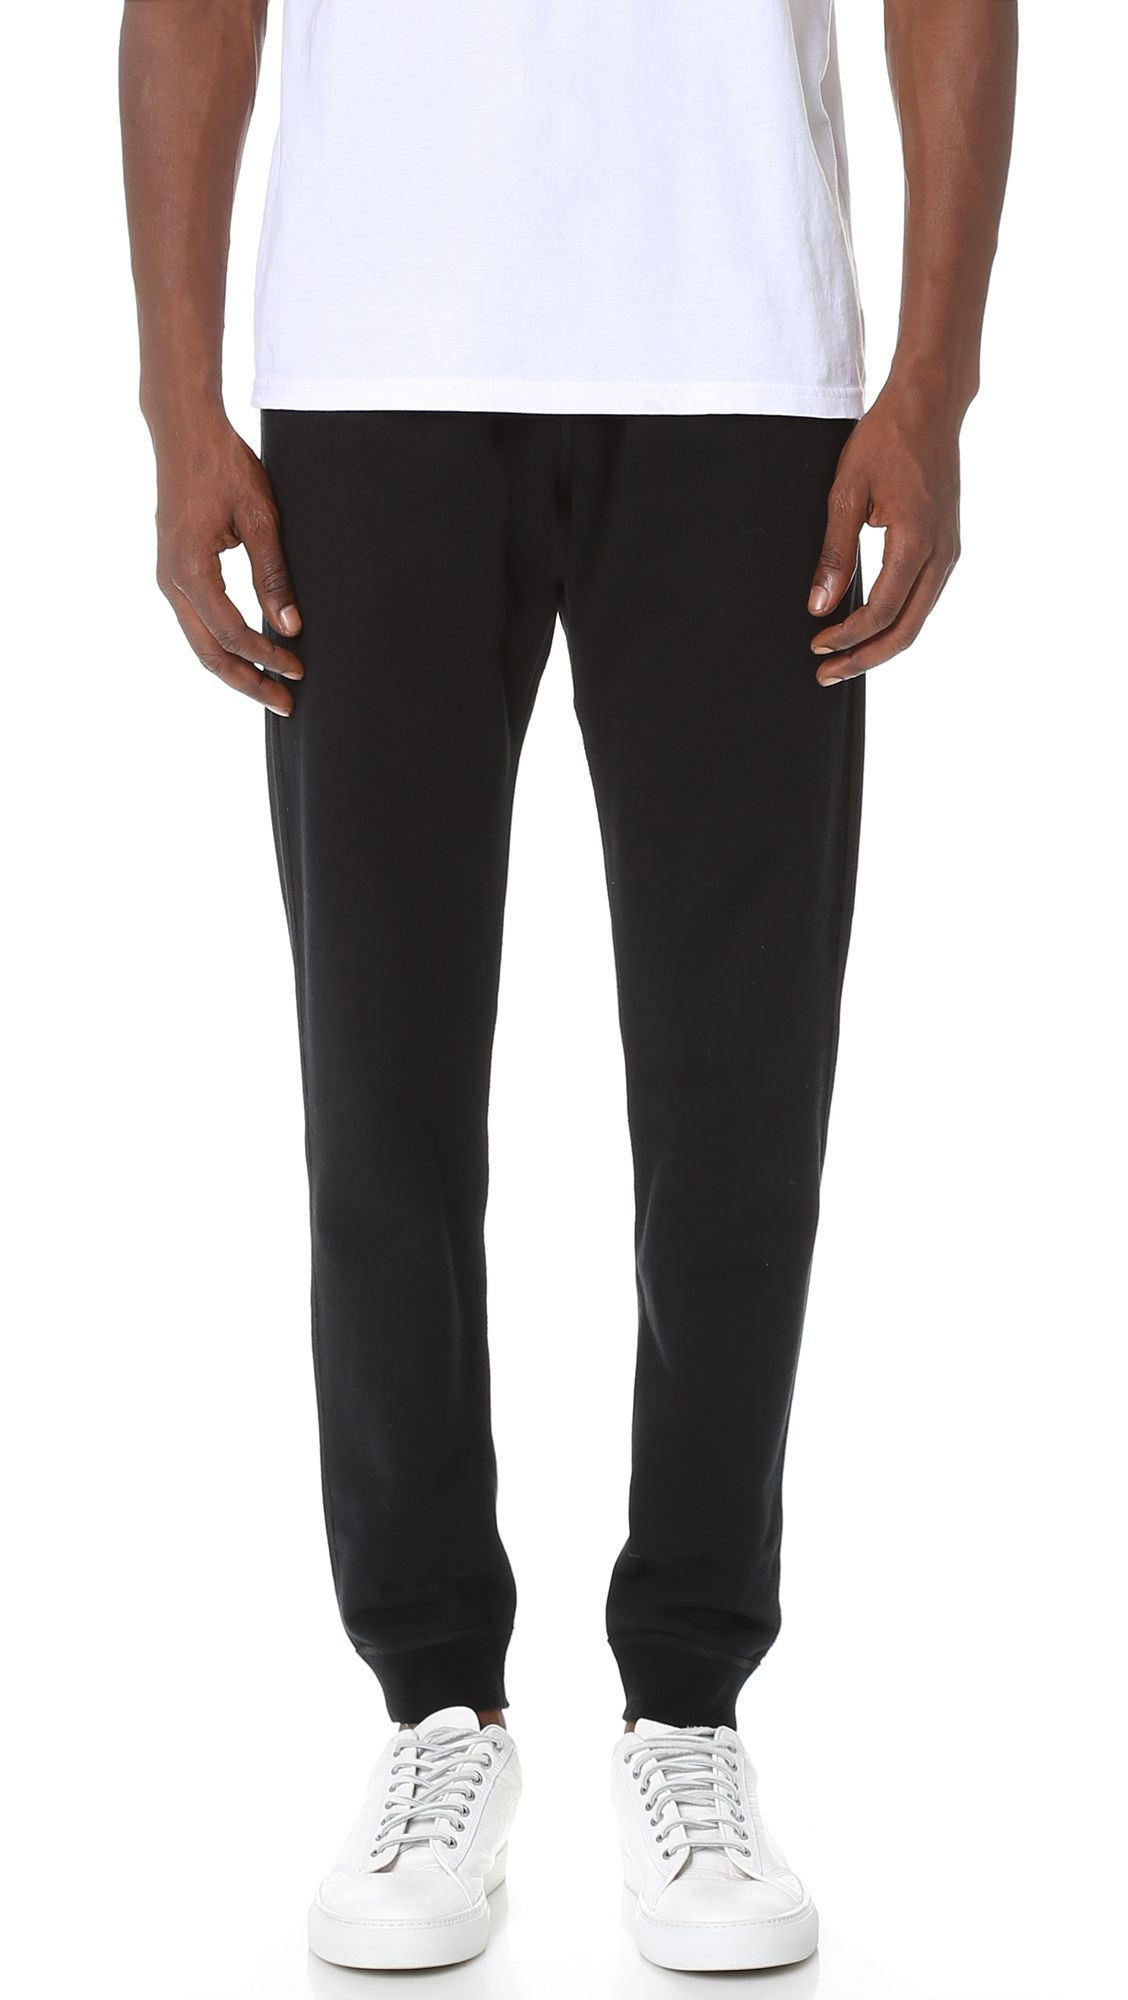 fe472985e8a1 REIGNING CHAMP Terry Slim Sweatpants.  reigningchamp  cloth  sweatpants